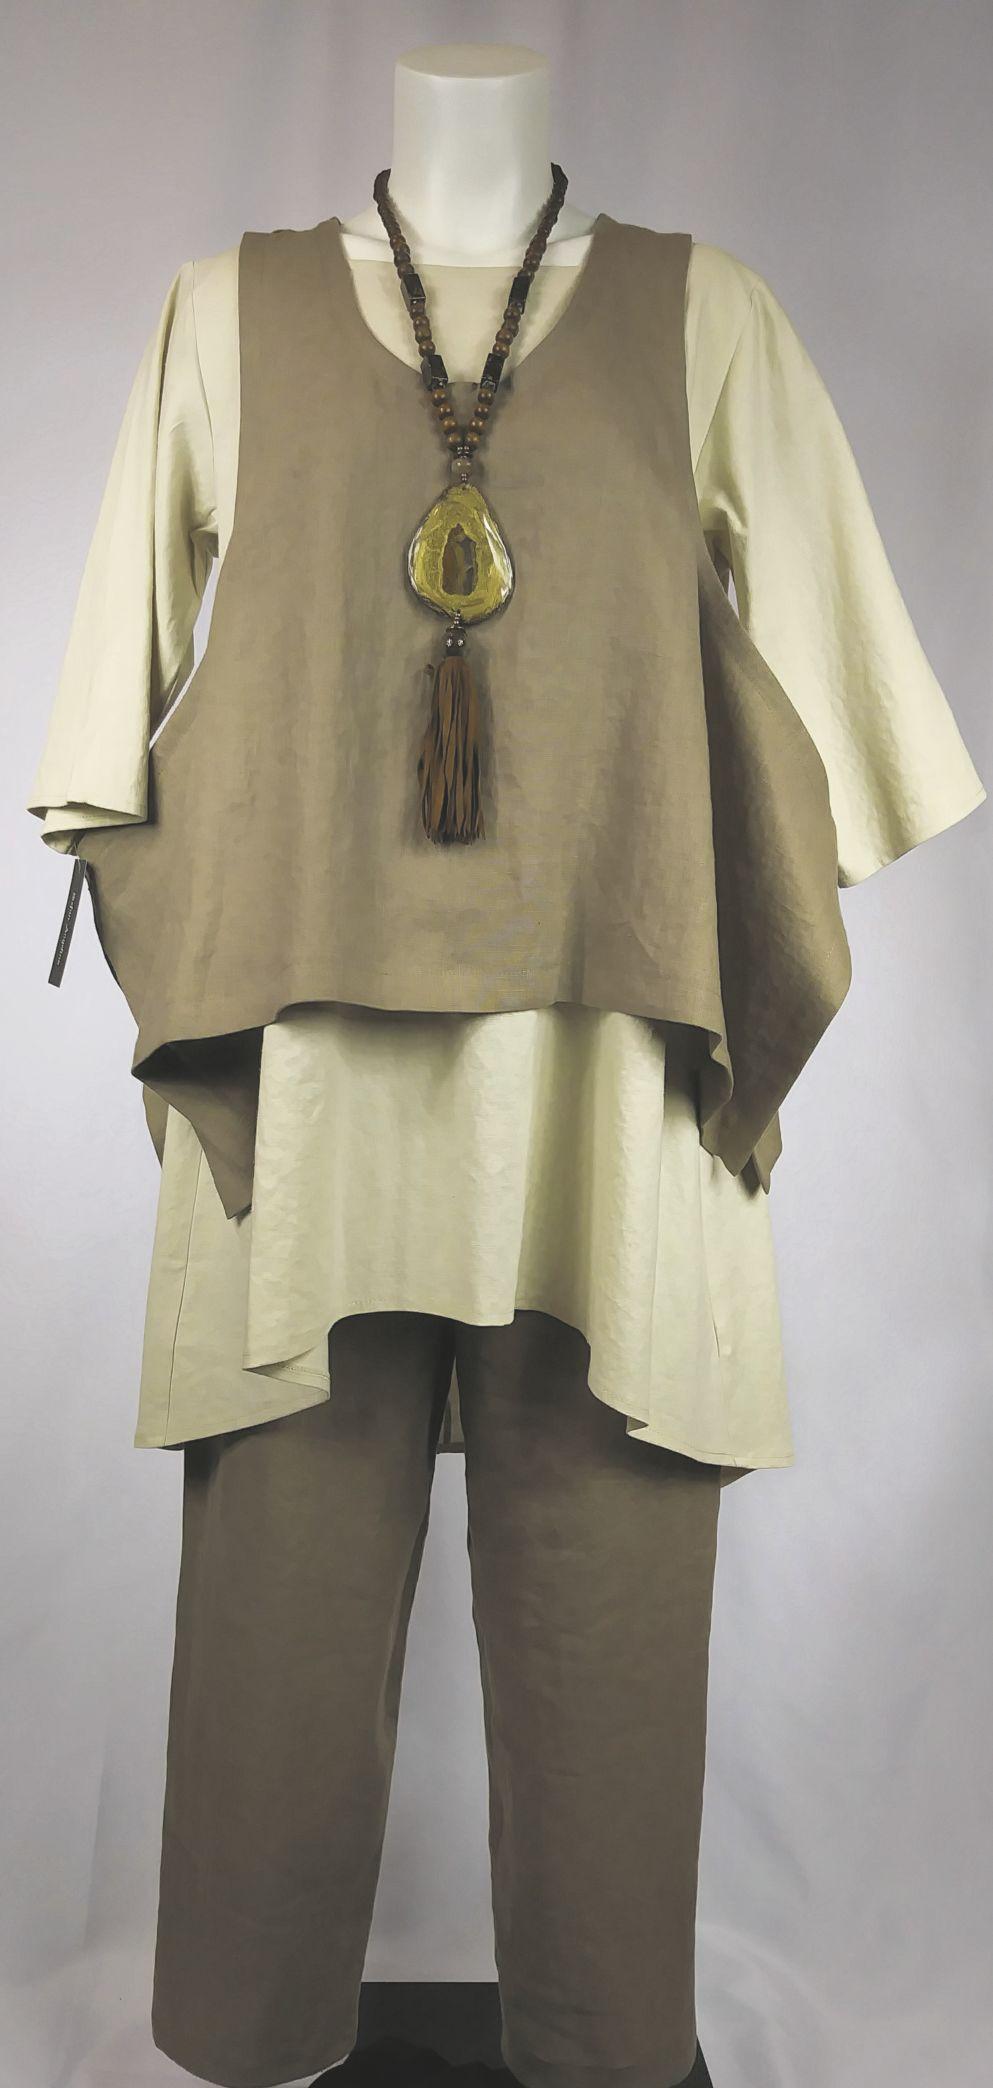 031319_MNS_craft_show_002 Stephanie Williams' fashion wearables